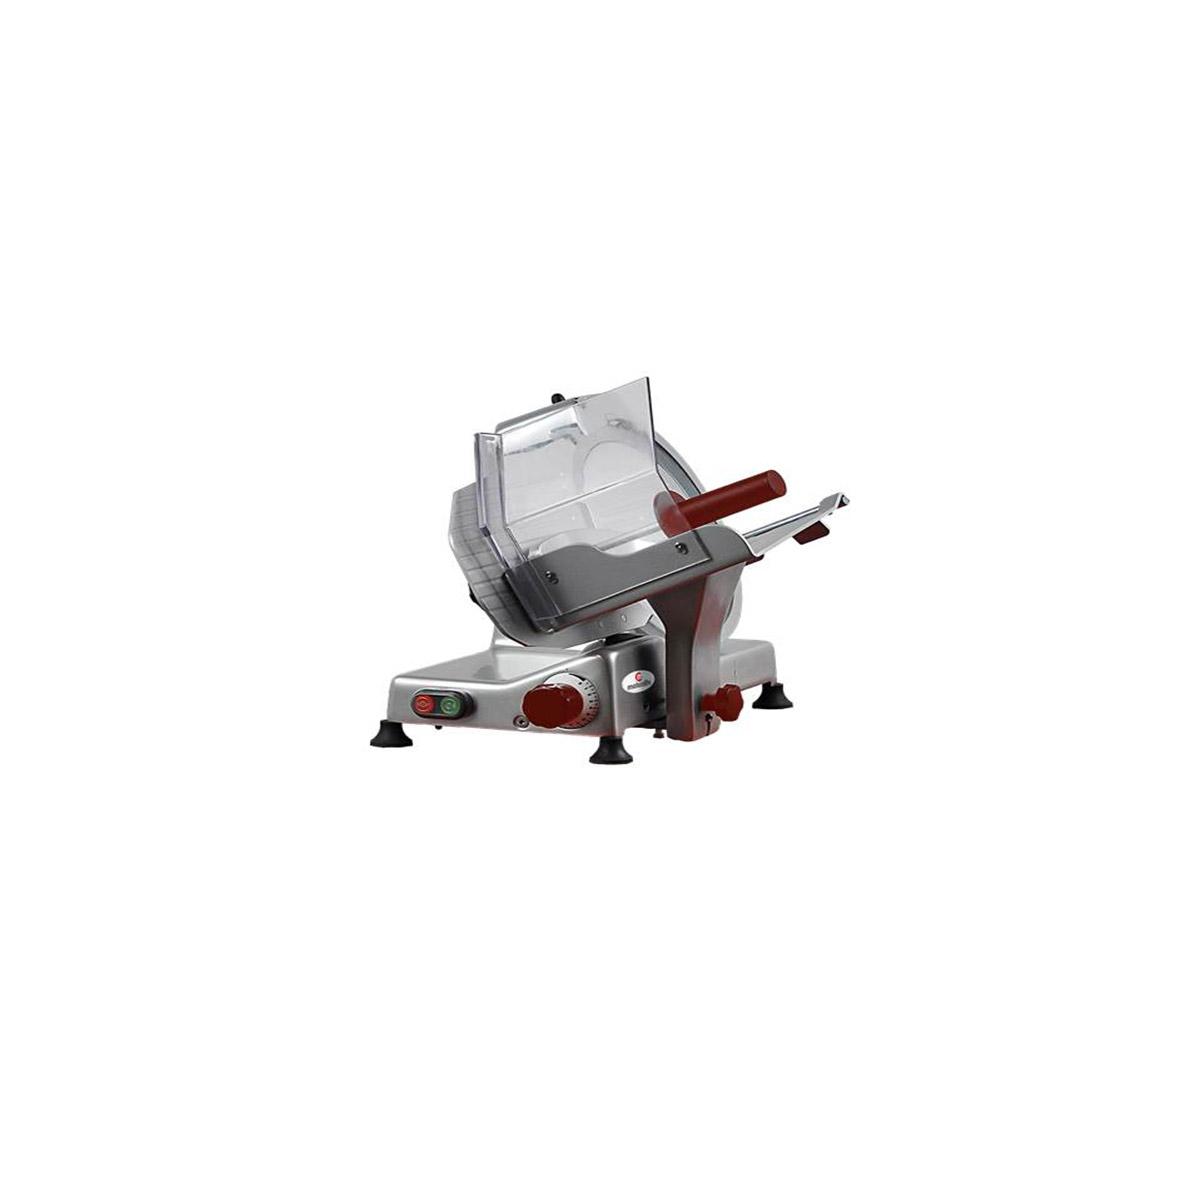 Metcalfe NSL250 Light Duty Gravity Feed Slicer